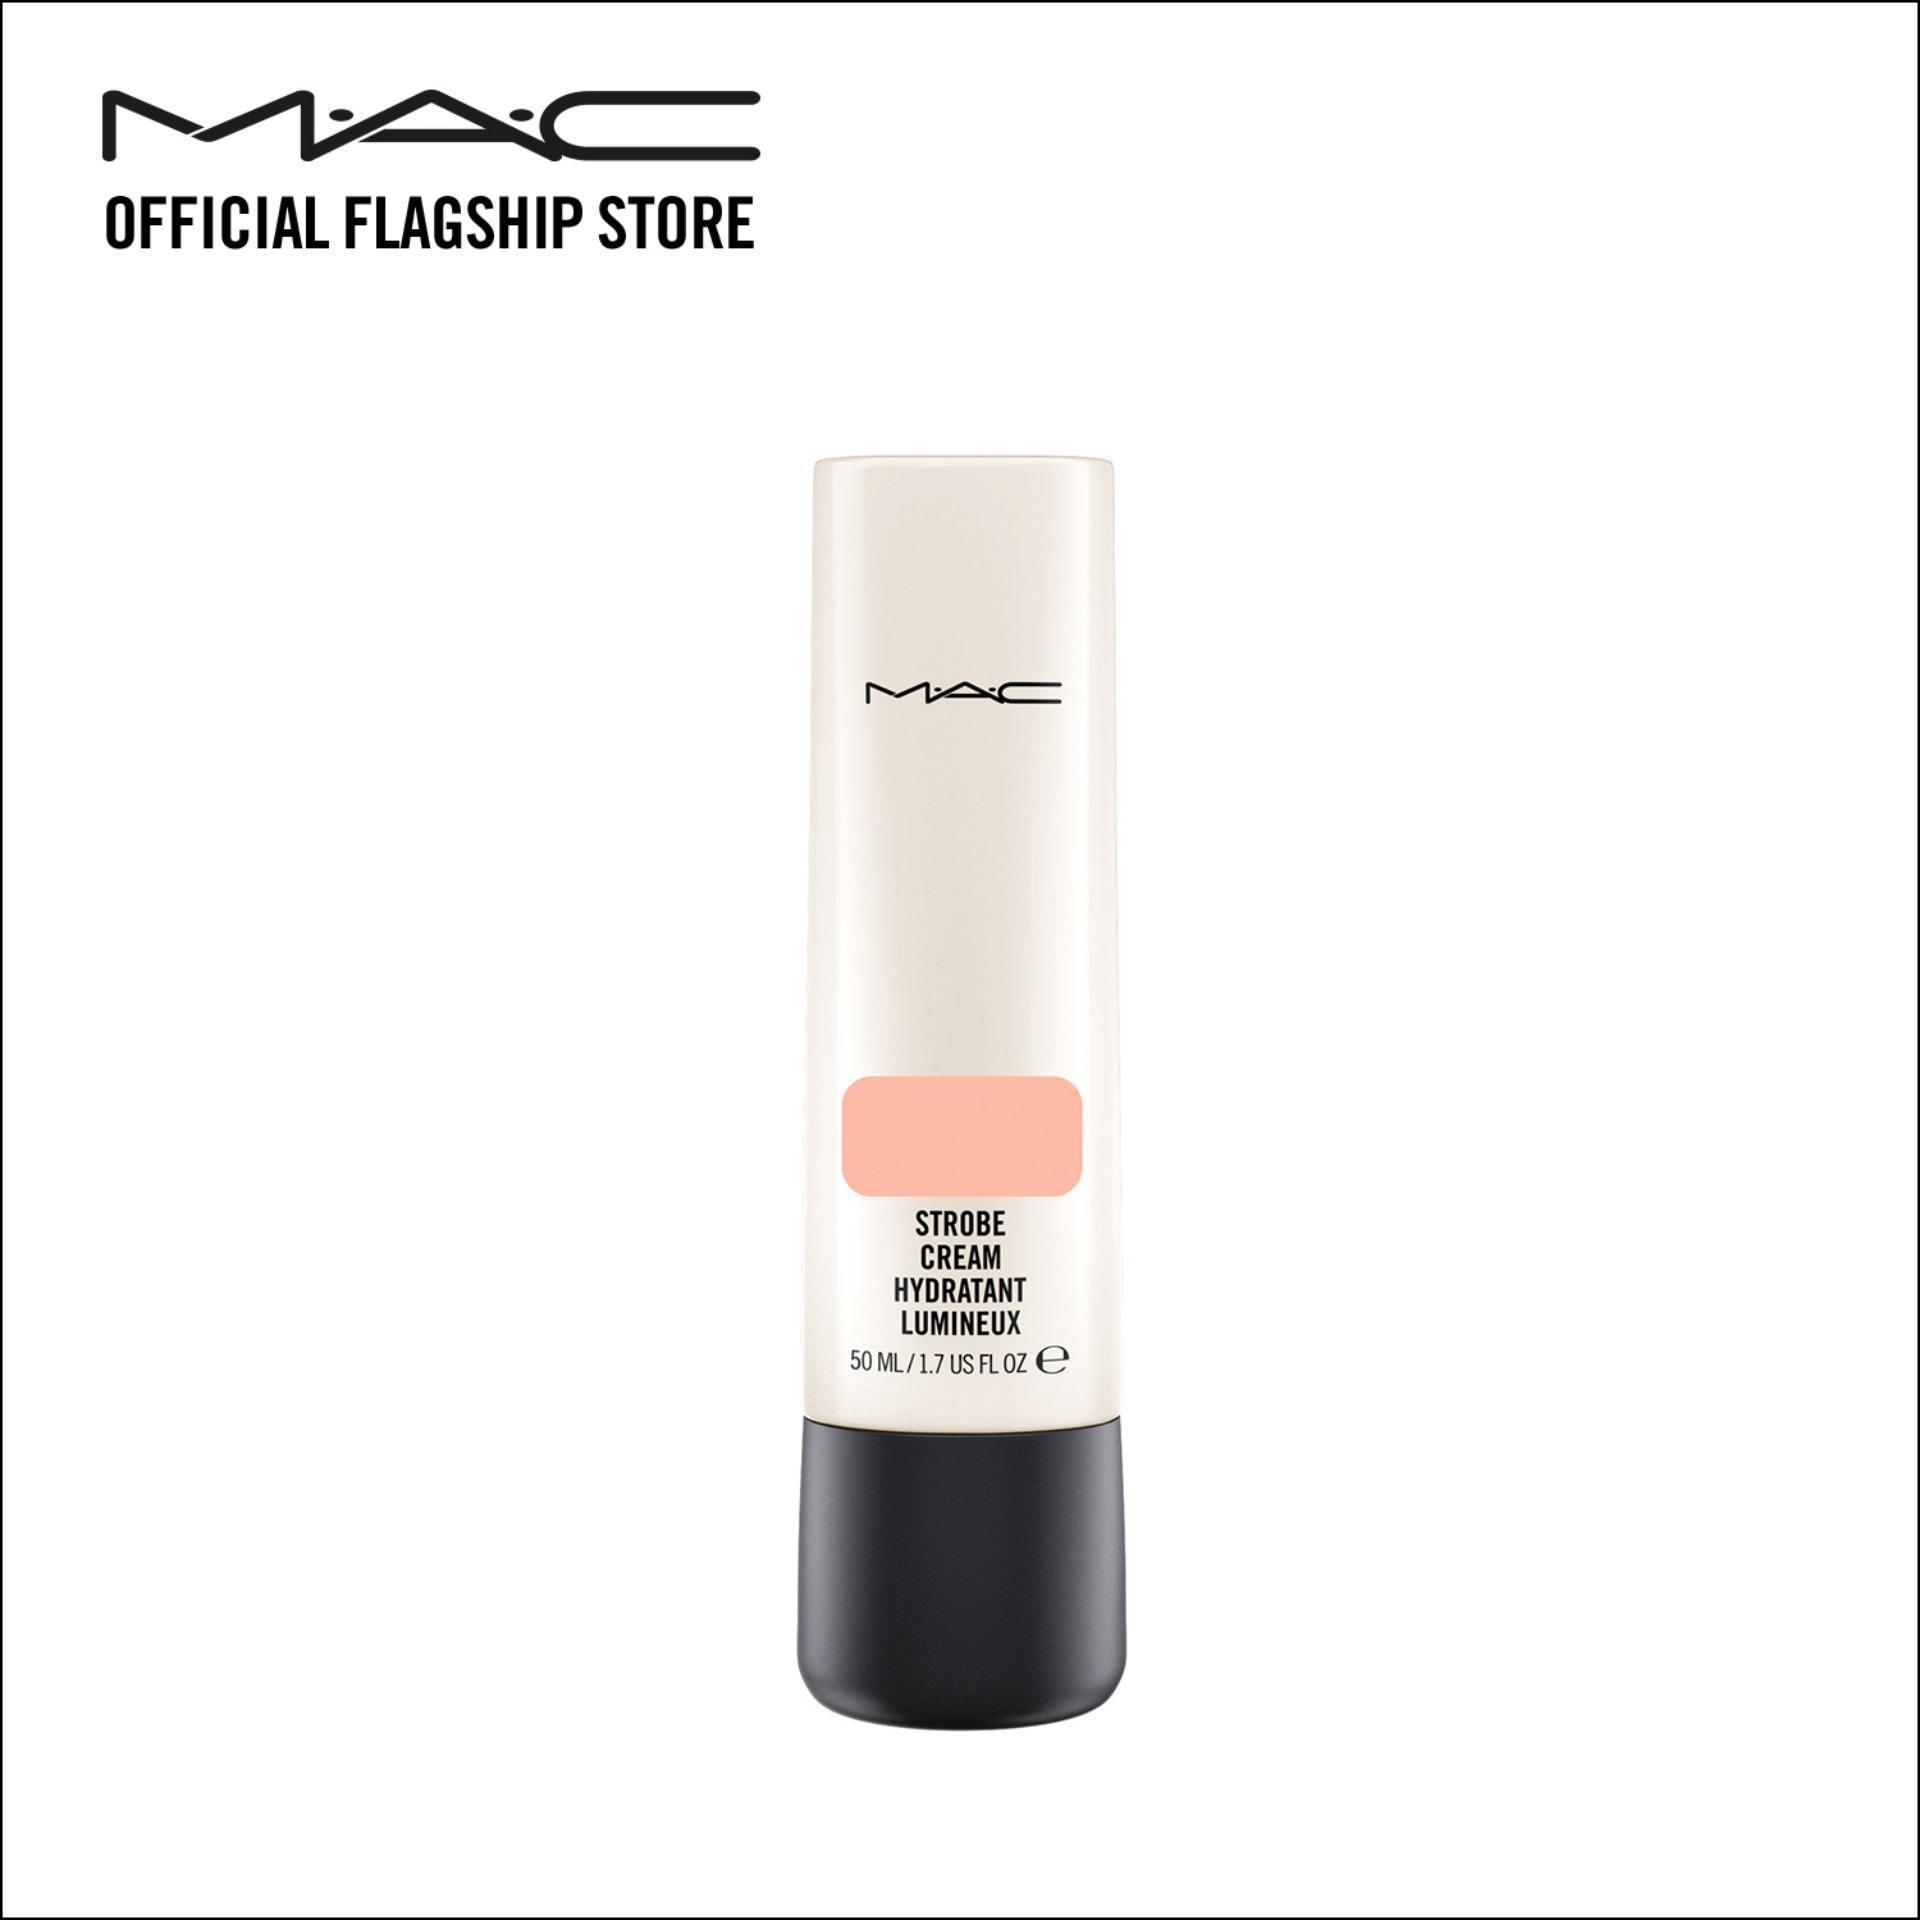 Kem bắt sáng MAC Strobe Cream 50ml tốt nhất